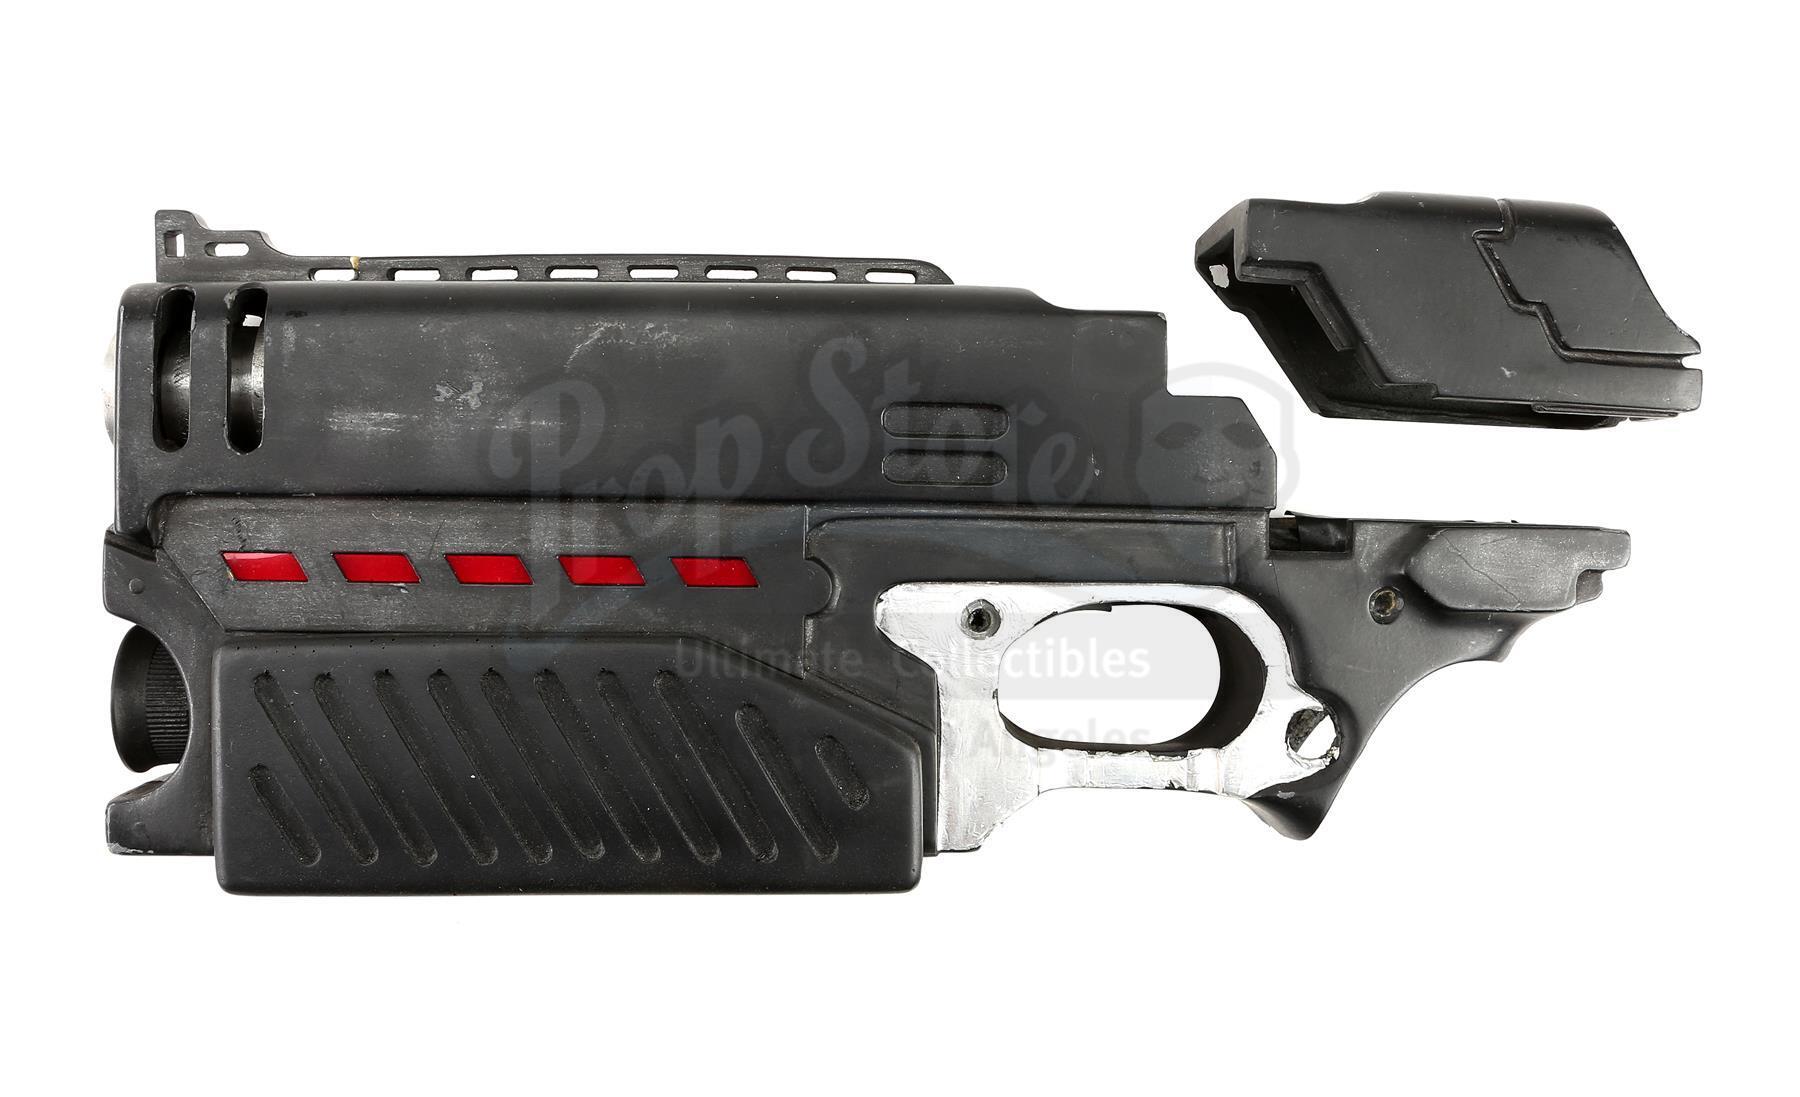 Lot # 802: JUDGE DREDD - Lawgiver Pistol Components